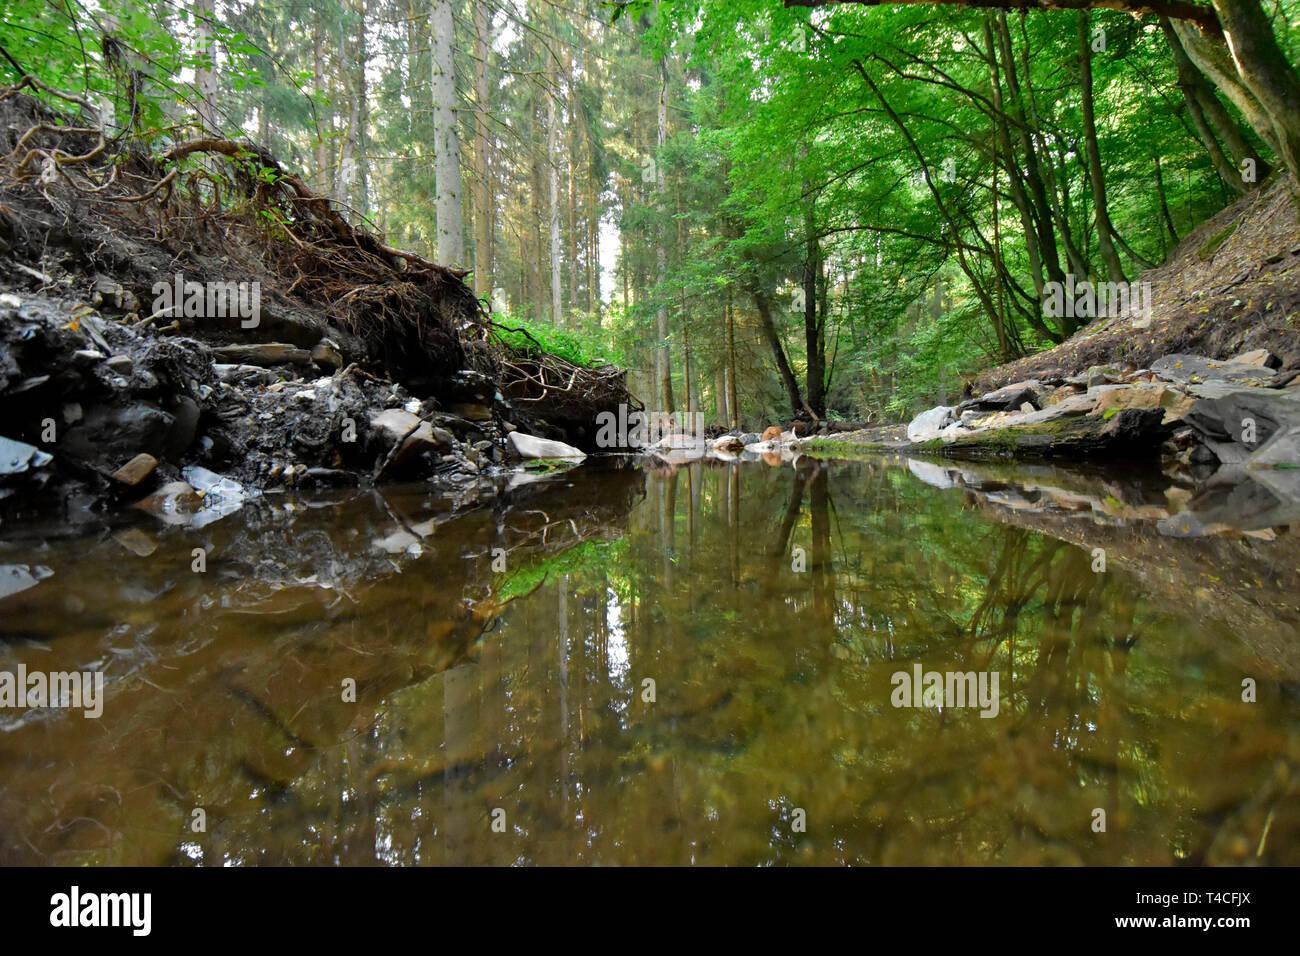 Traumschleife, Charcoal Burner Premium Hiking Path, Germany, Rhineland-Palatinate, Hunsrueck, Köhlerpfad - Stock Image